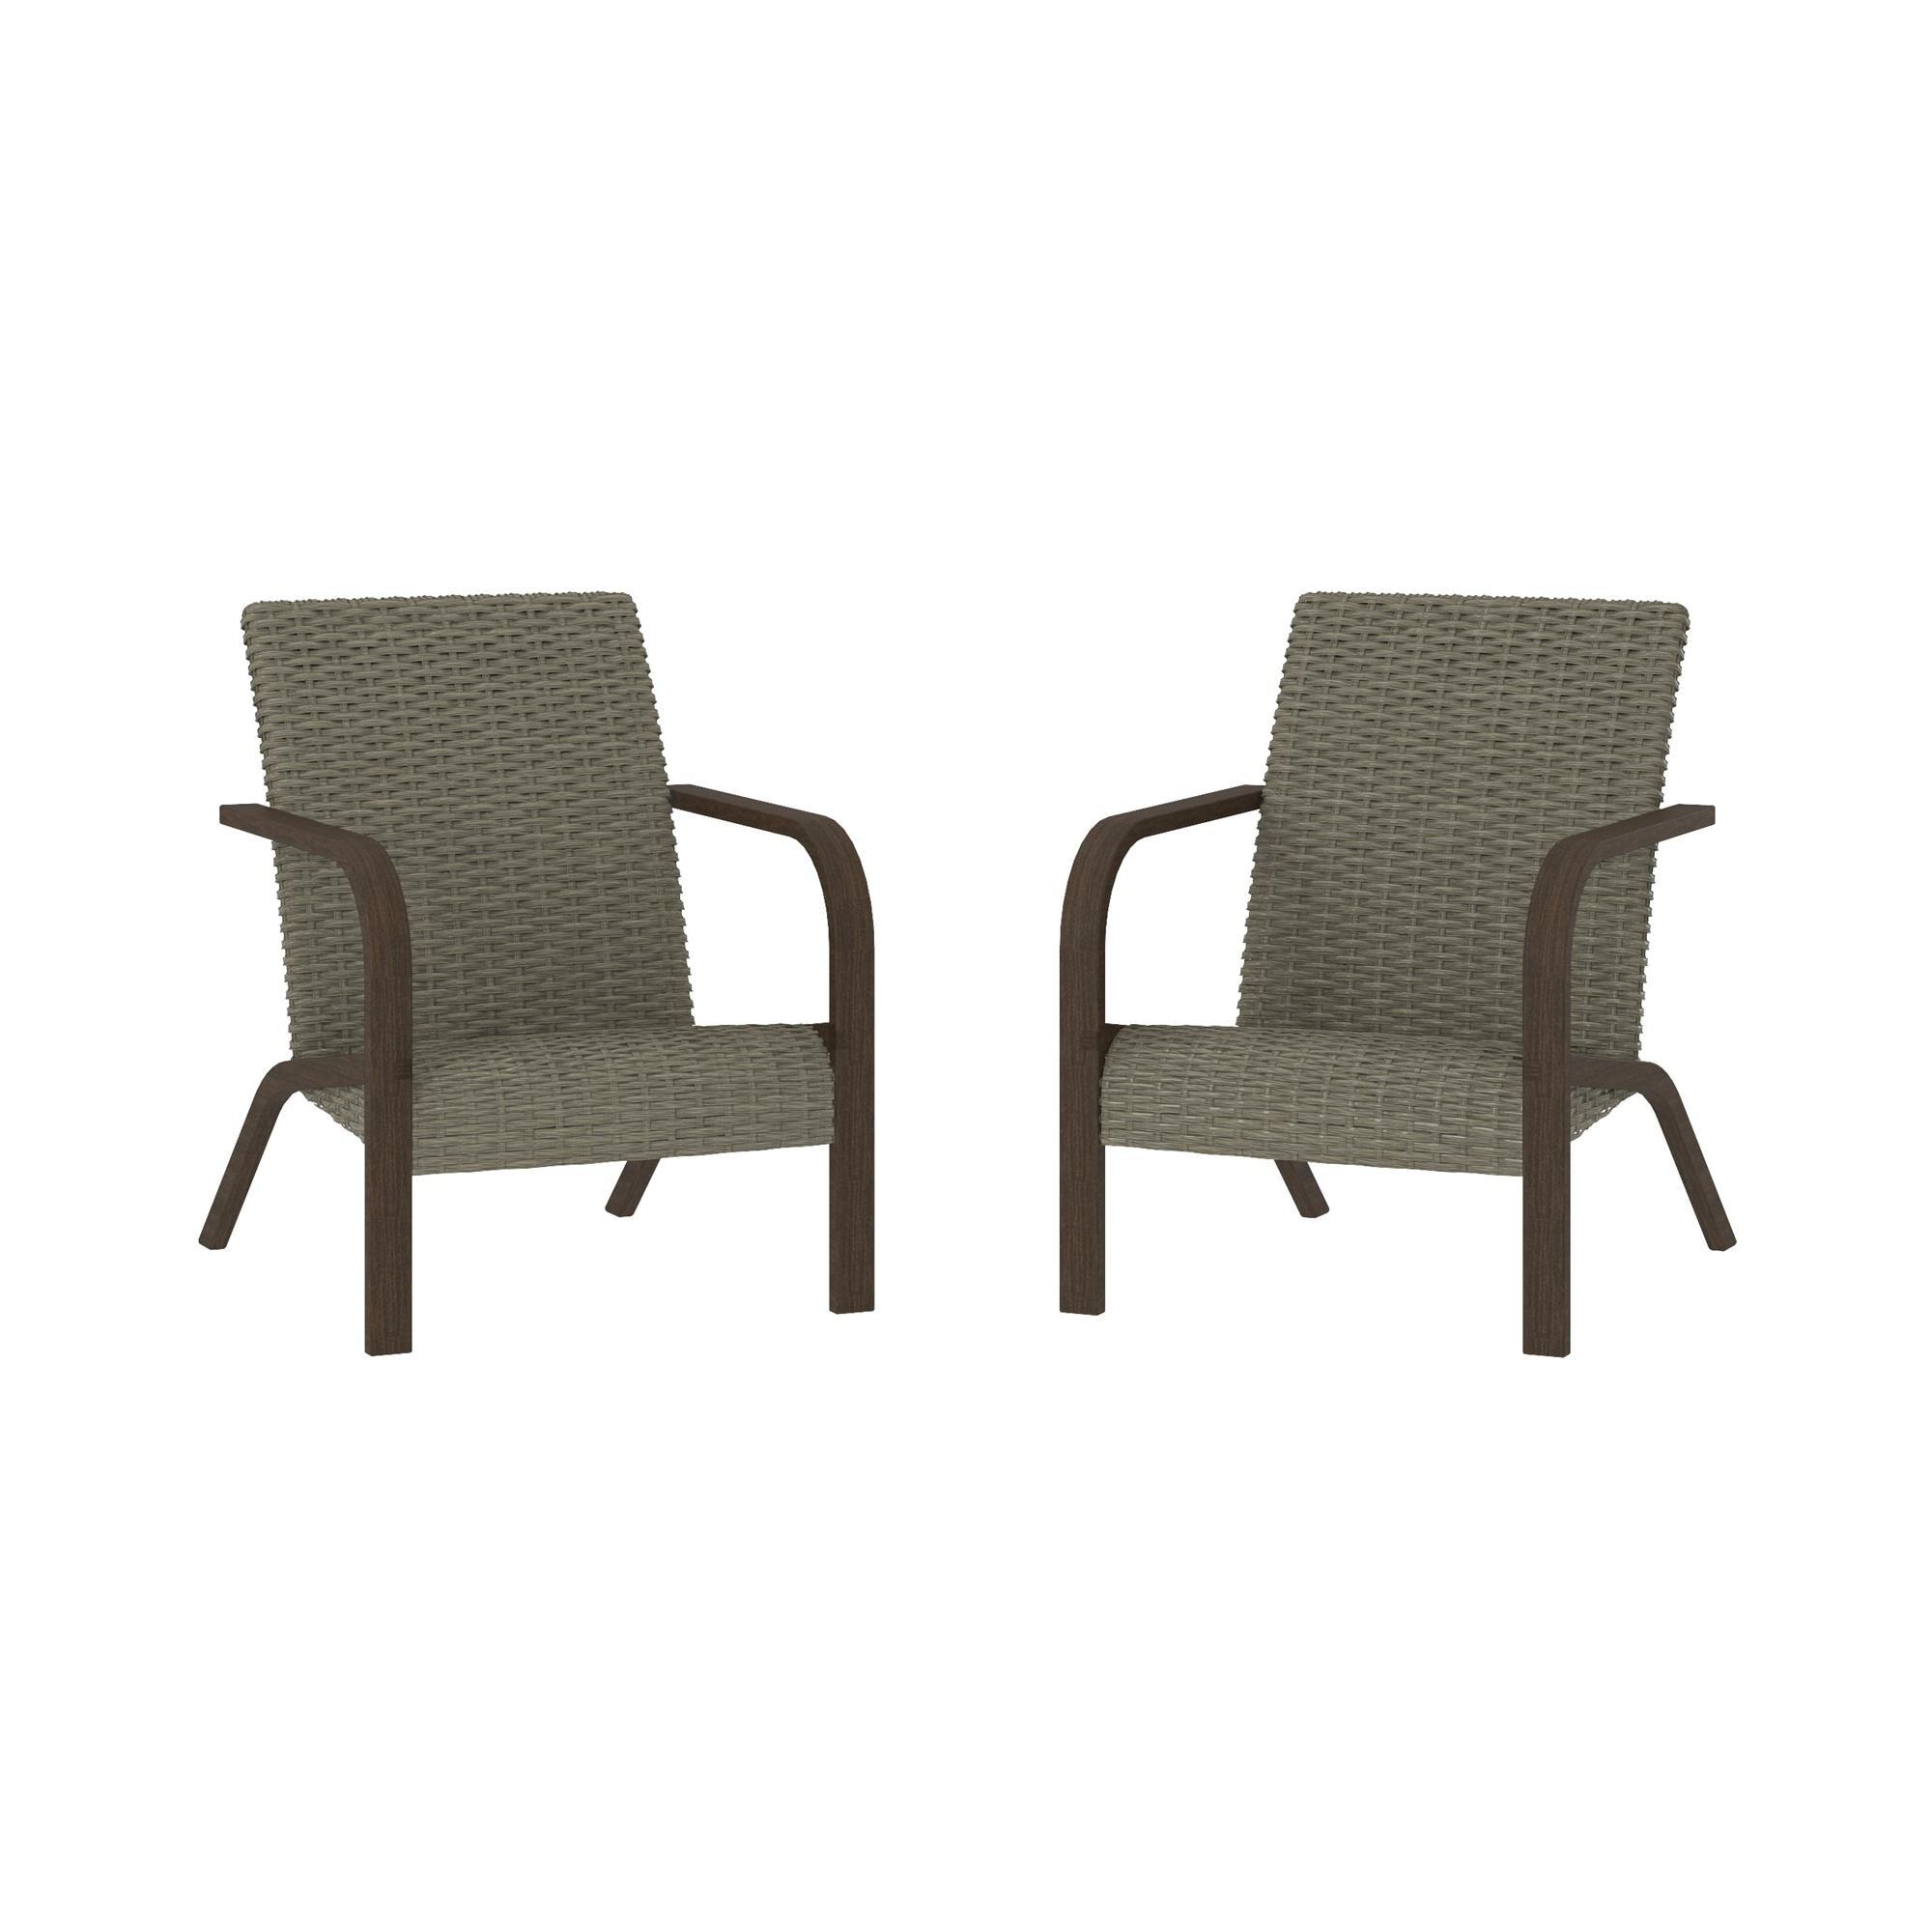 Swell Cosco Outdoor Furniture Villa Park Smartwick Patio Conversation Set 4 Piece Set Download Free Architecture Designs Barepgrimeyleaguecom